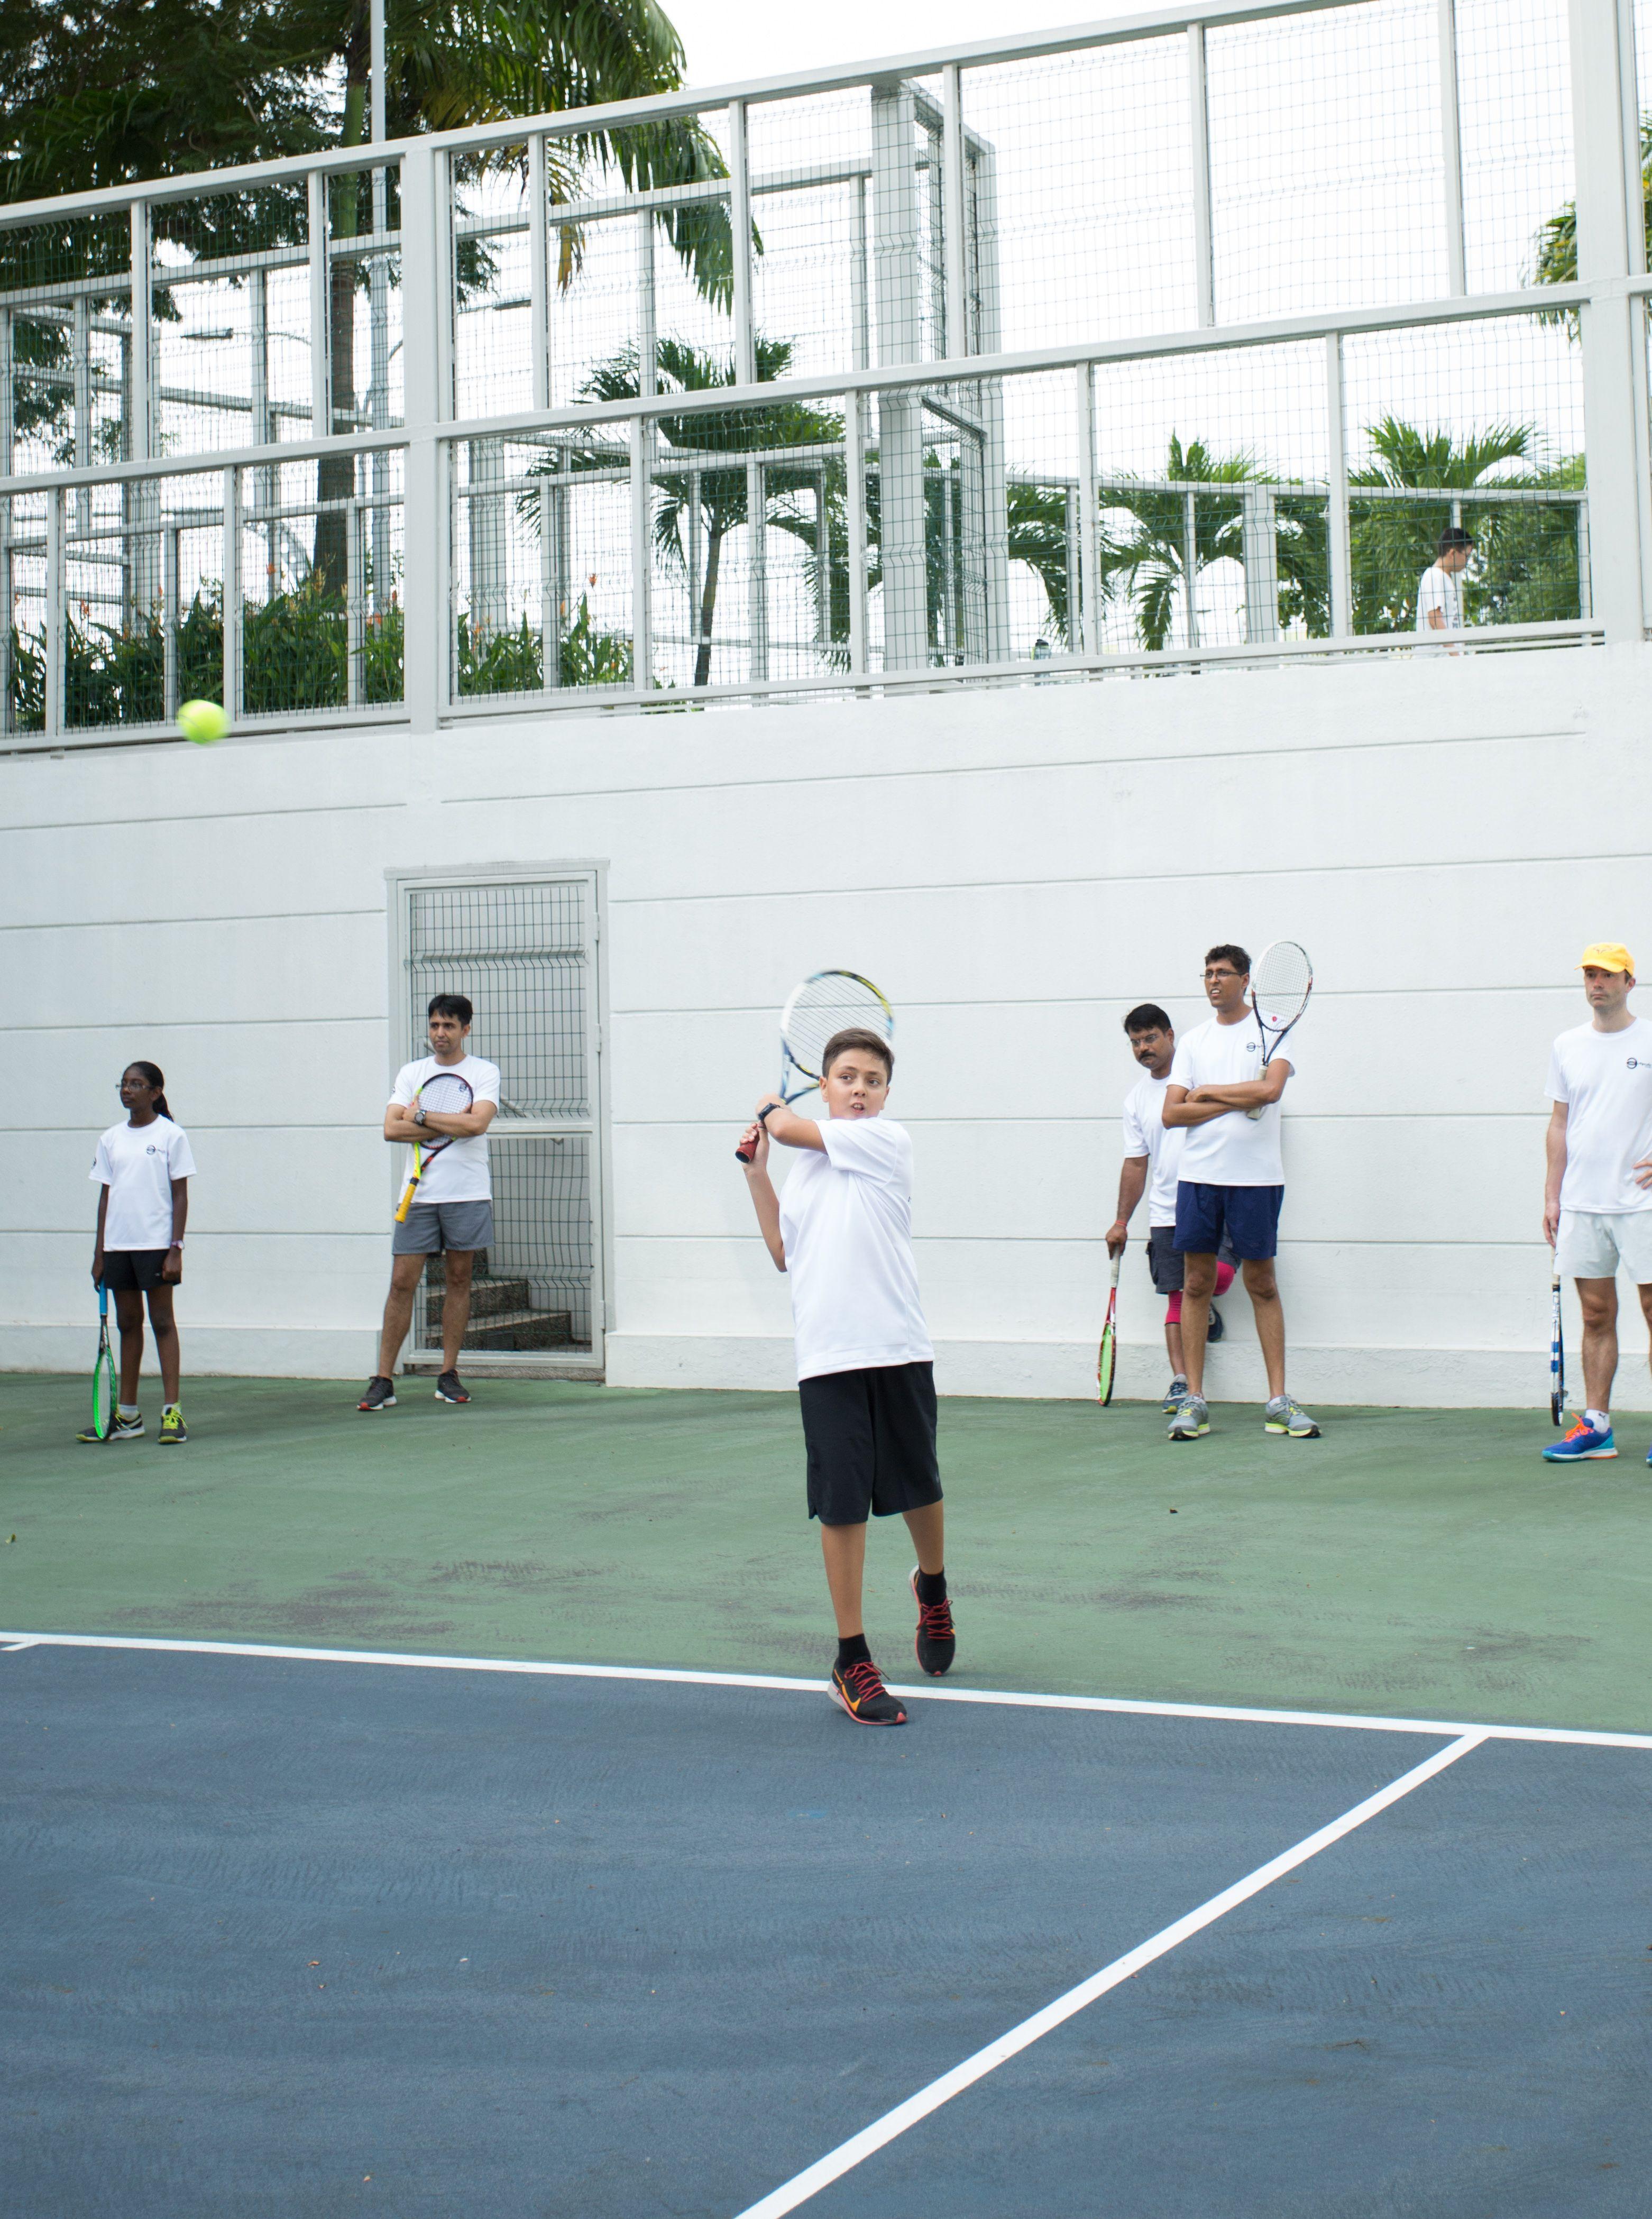 Tennis Lesson For Three